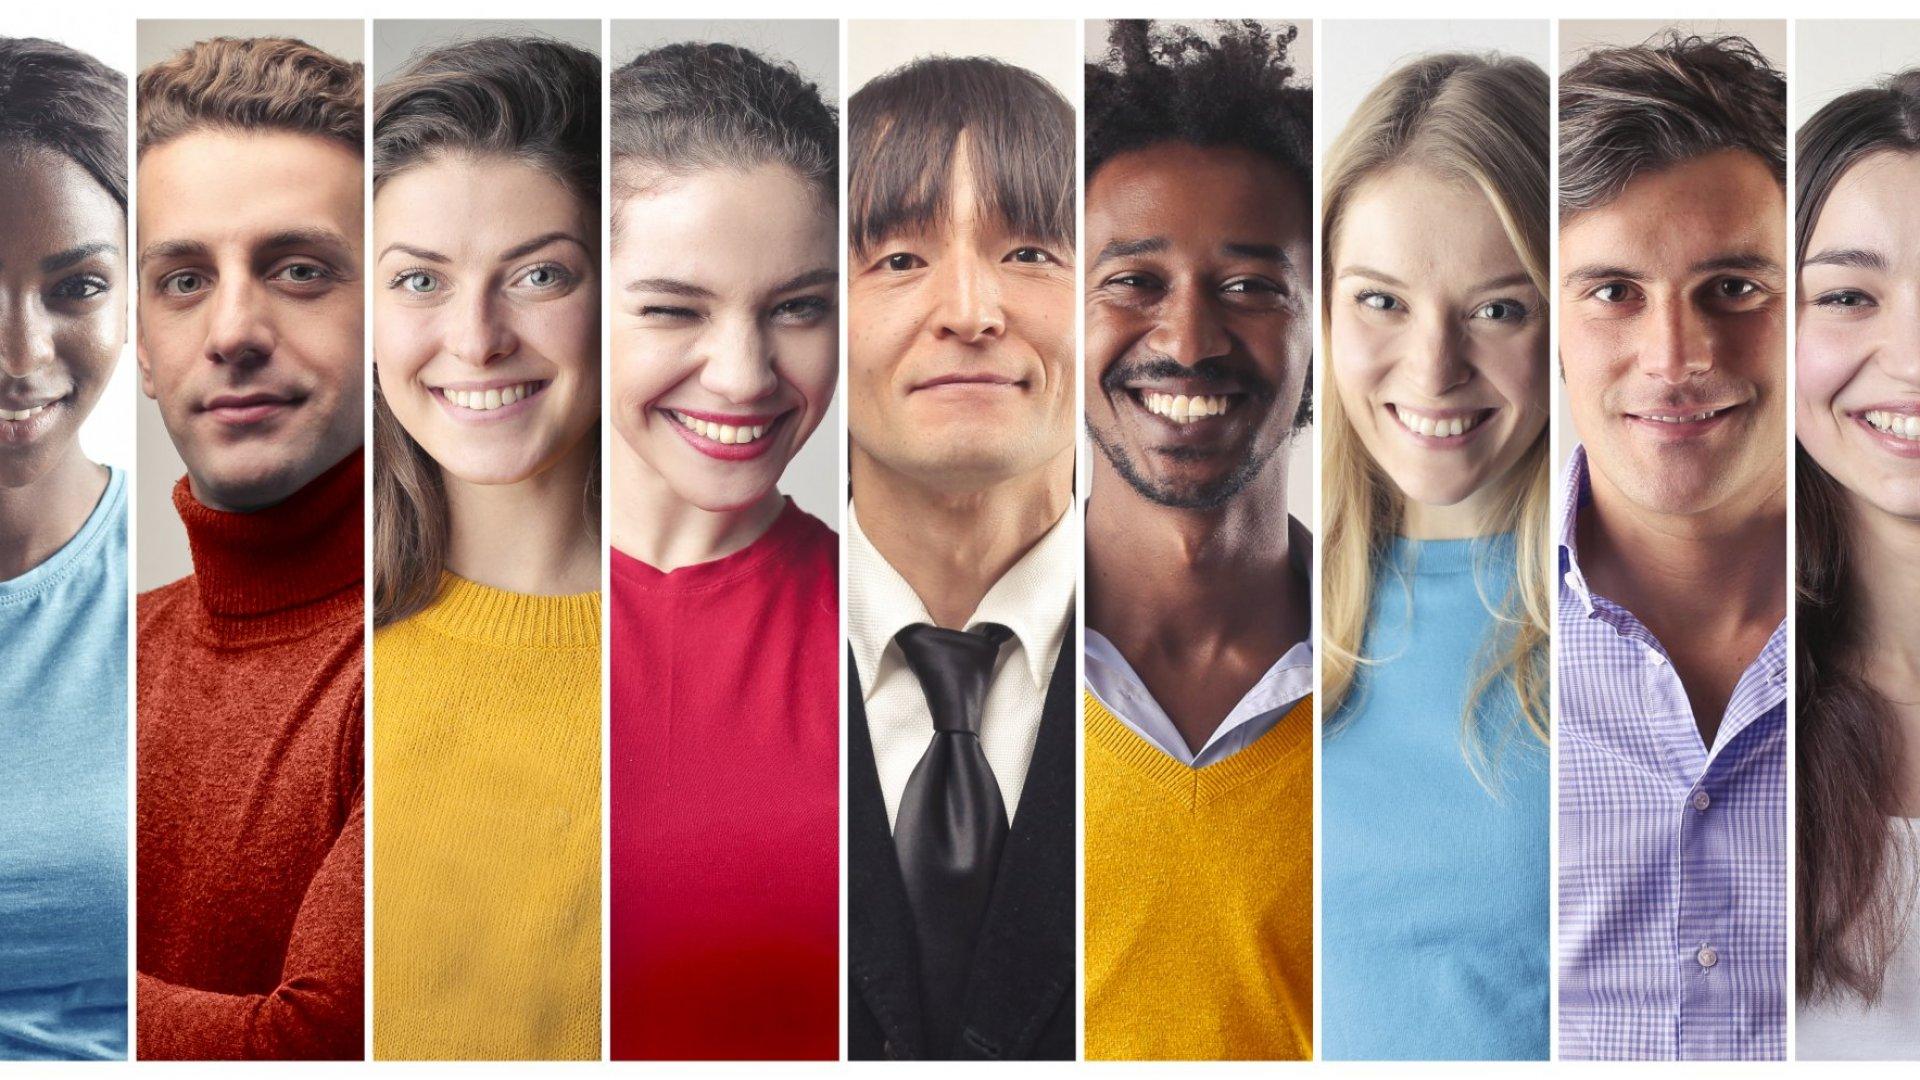 Walmart, IBM, Pepsico and 172 Other U.S. Companies Pledge to Promote Diversity